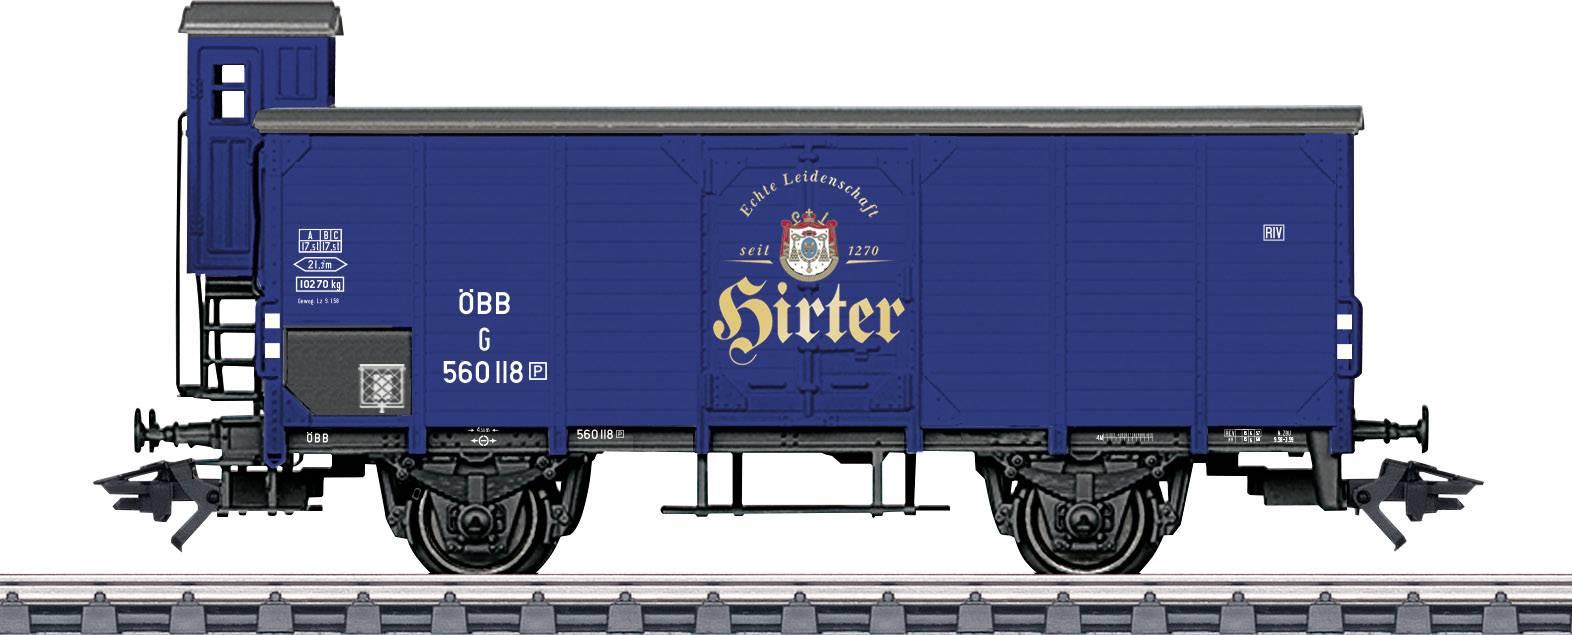 Märklin 48933 Vagone per il trasporto della birra H0 Hirt di ÖBB